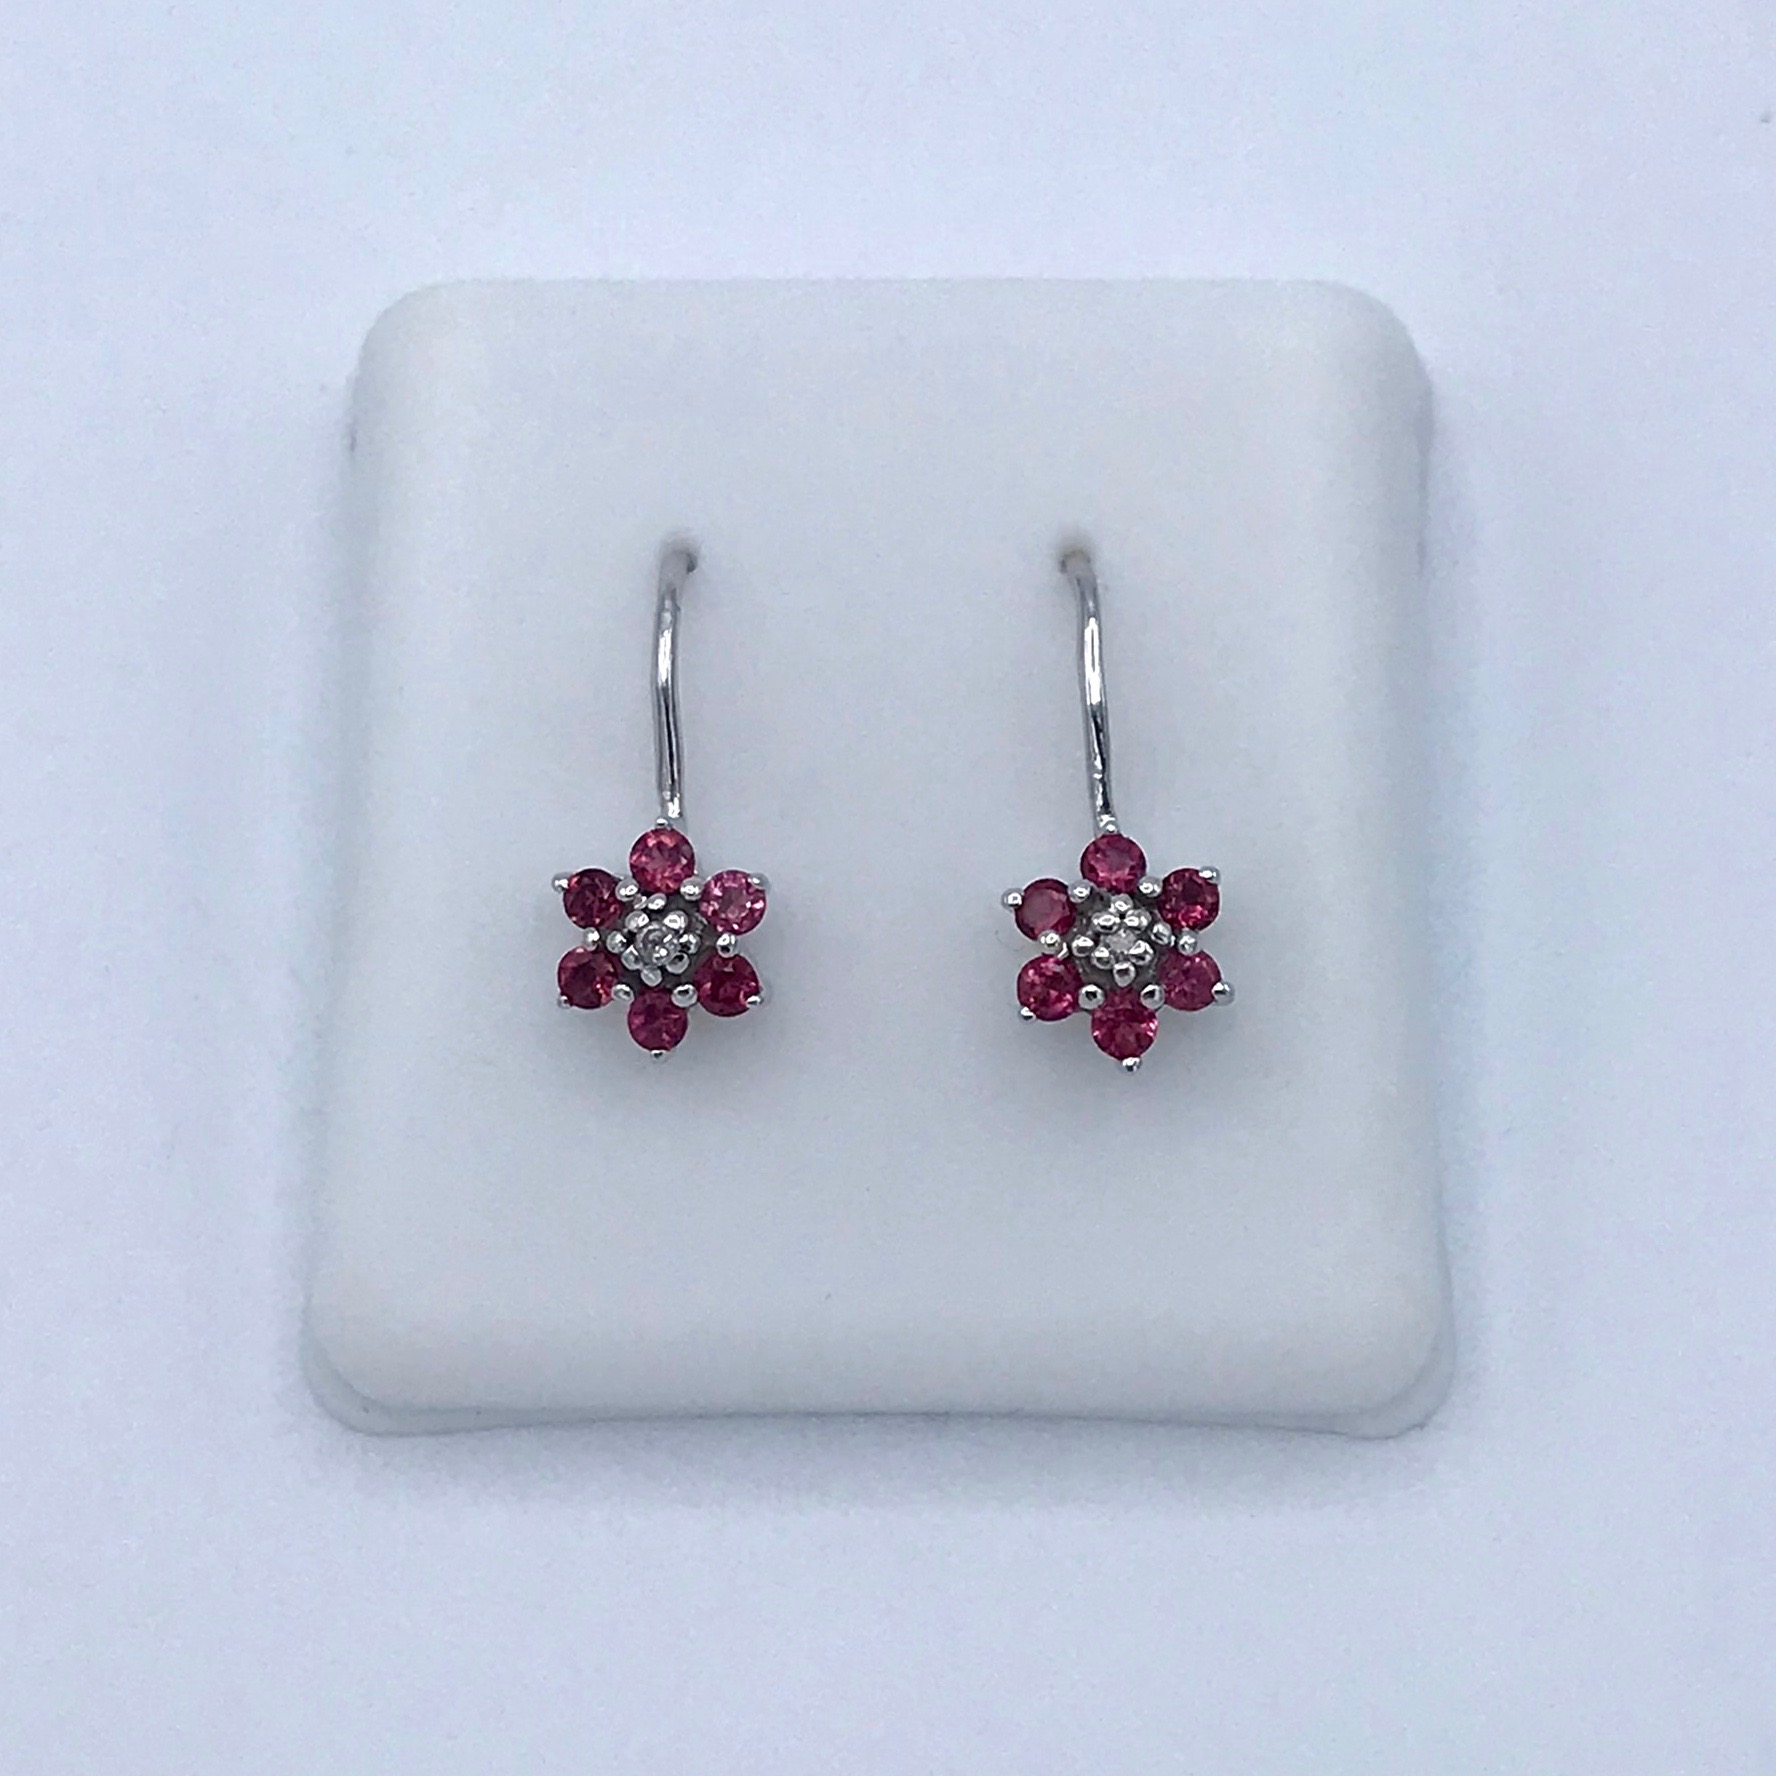 14KT & Garnet/Diamond Flower Earrings